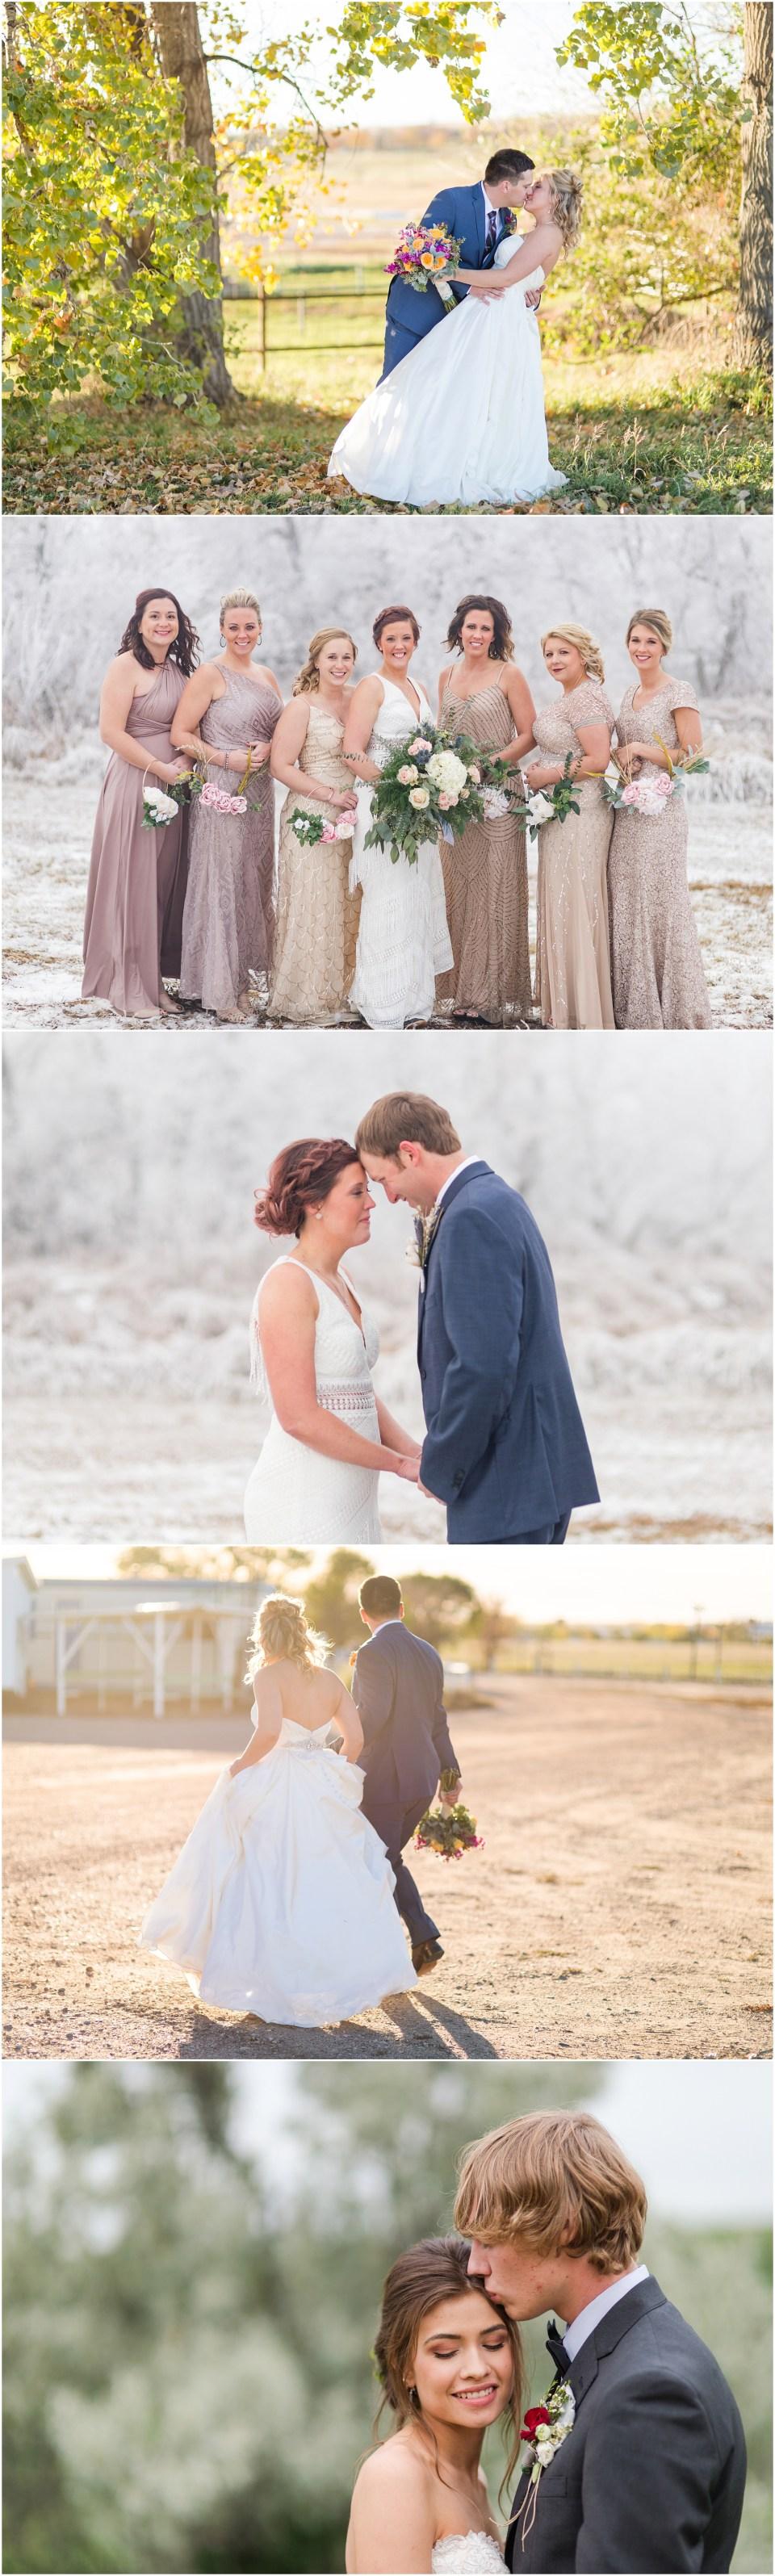 best lens for wedding photographer chelsy weisz photography North Dakota